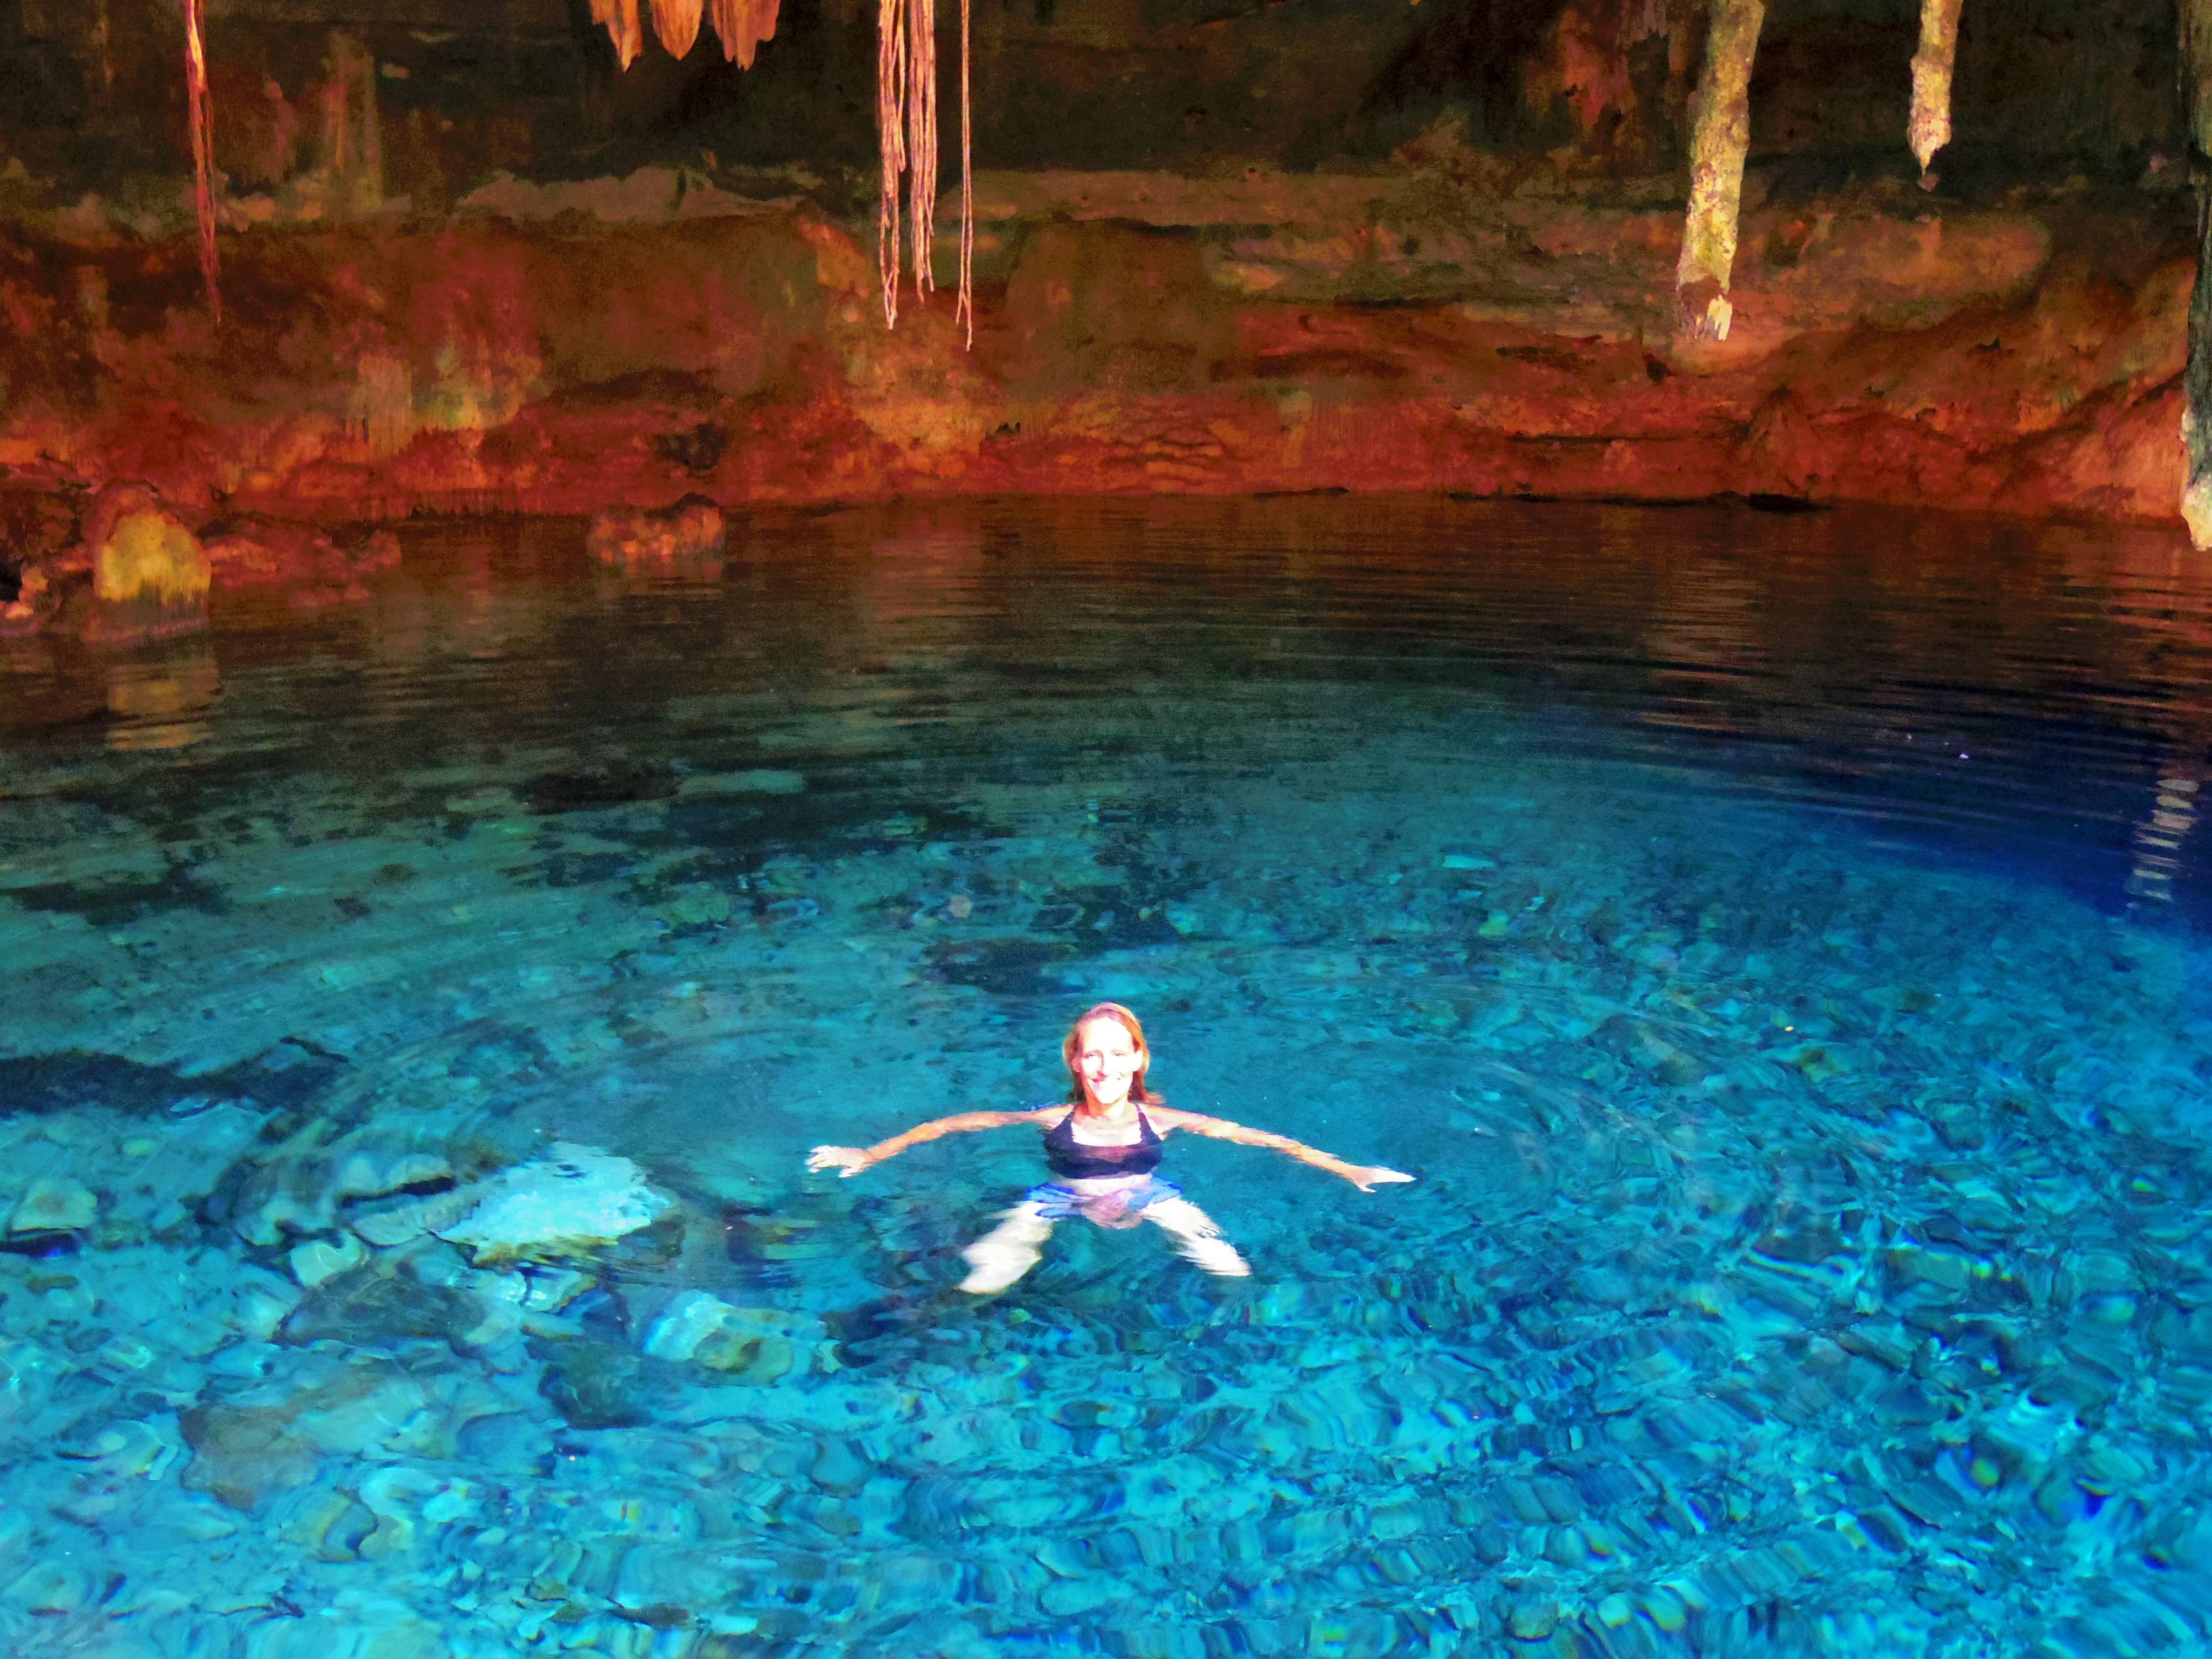 Photo 1: Baignade aux portes du monde sous-terrain - Cenote Kankirixche